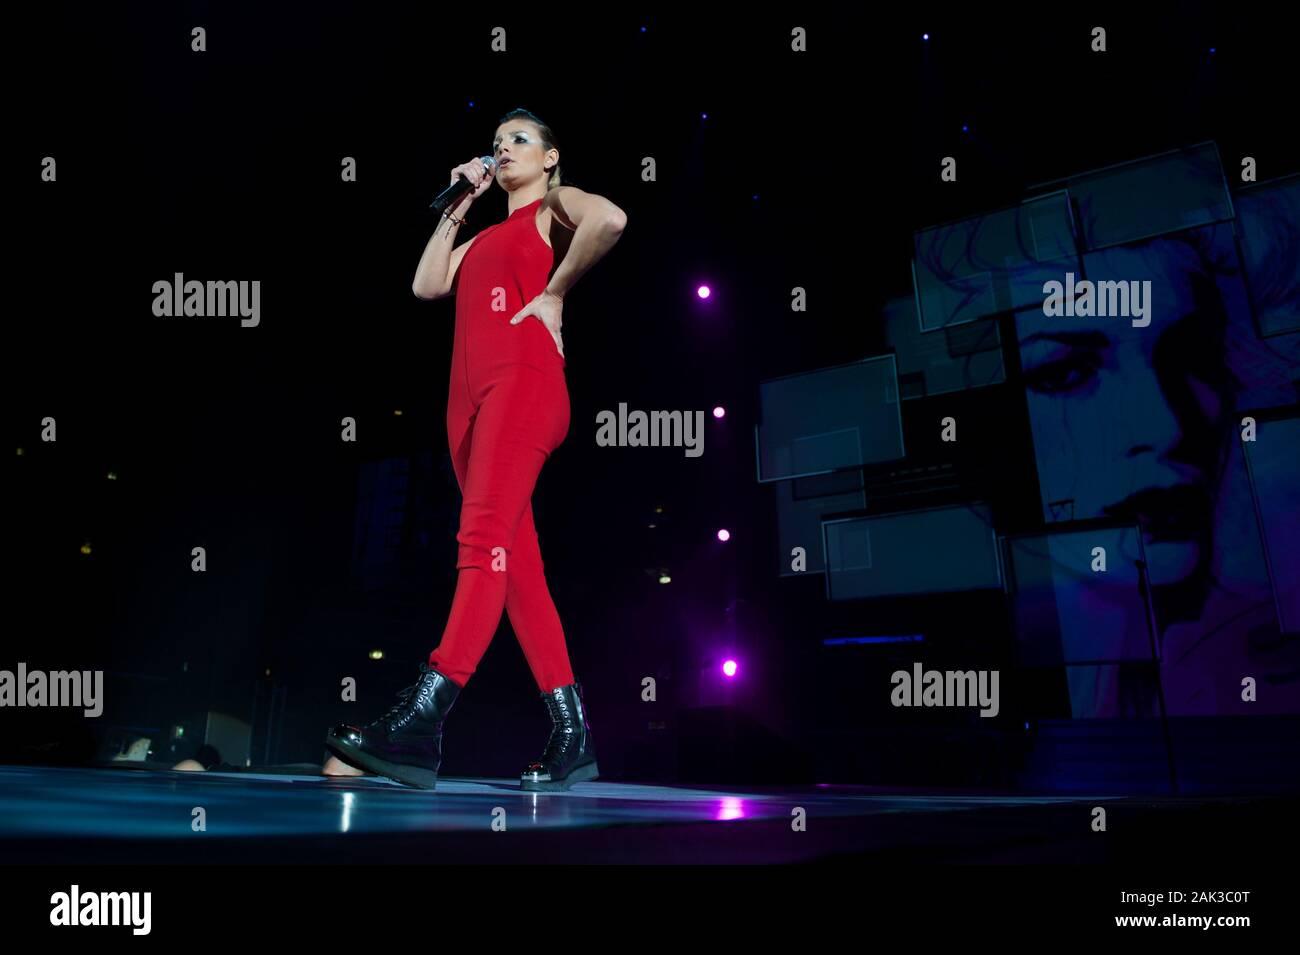 Milan Italy  20 November 2013 : Live concert of Emma at the Mediolanum Forum Assago : Italian singer Emma during the concert Stock Photo